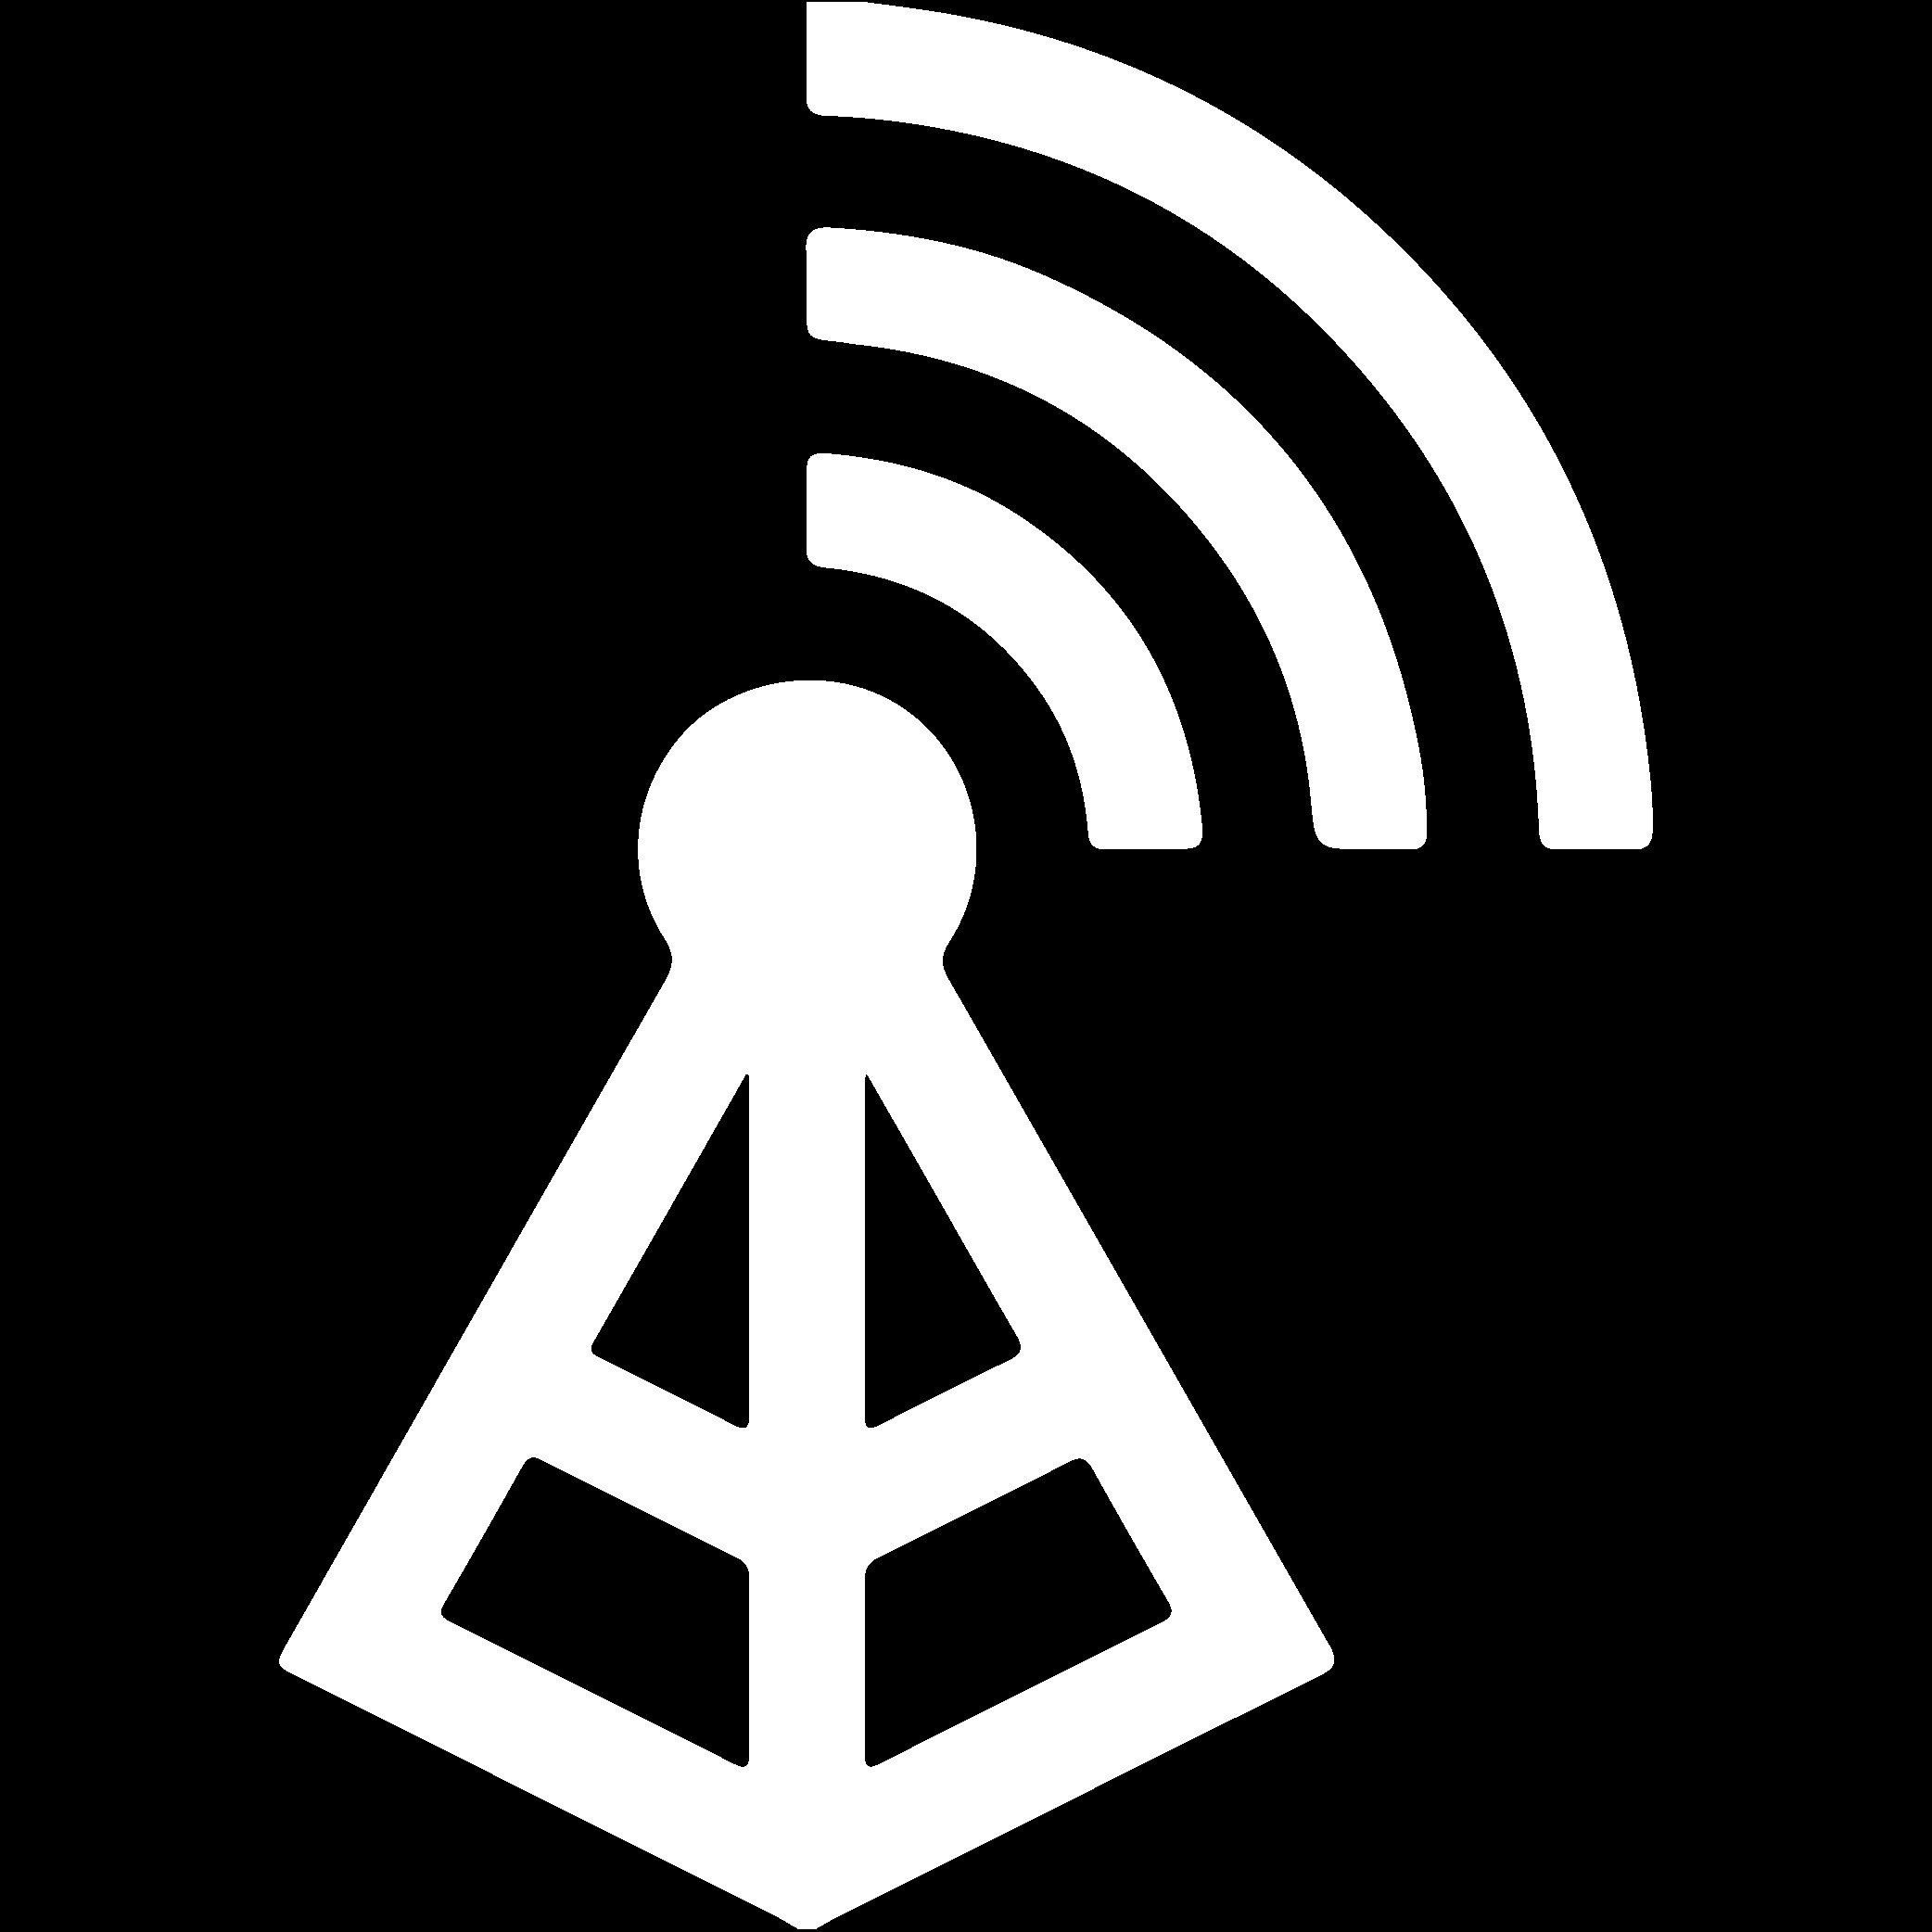 transparent and flexible antennas